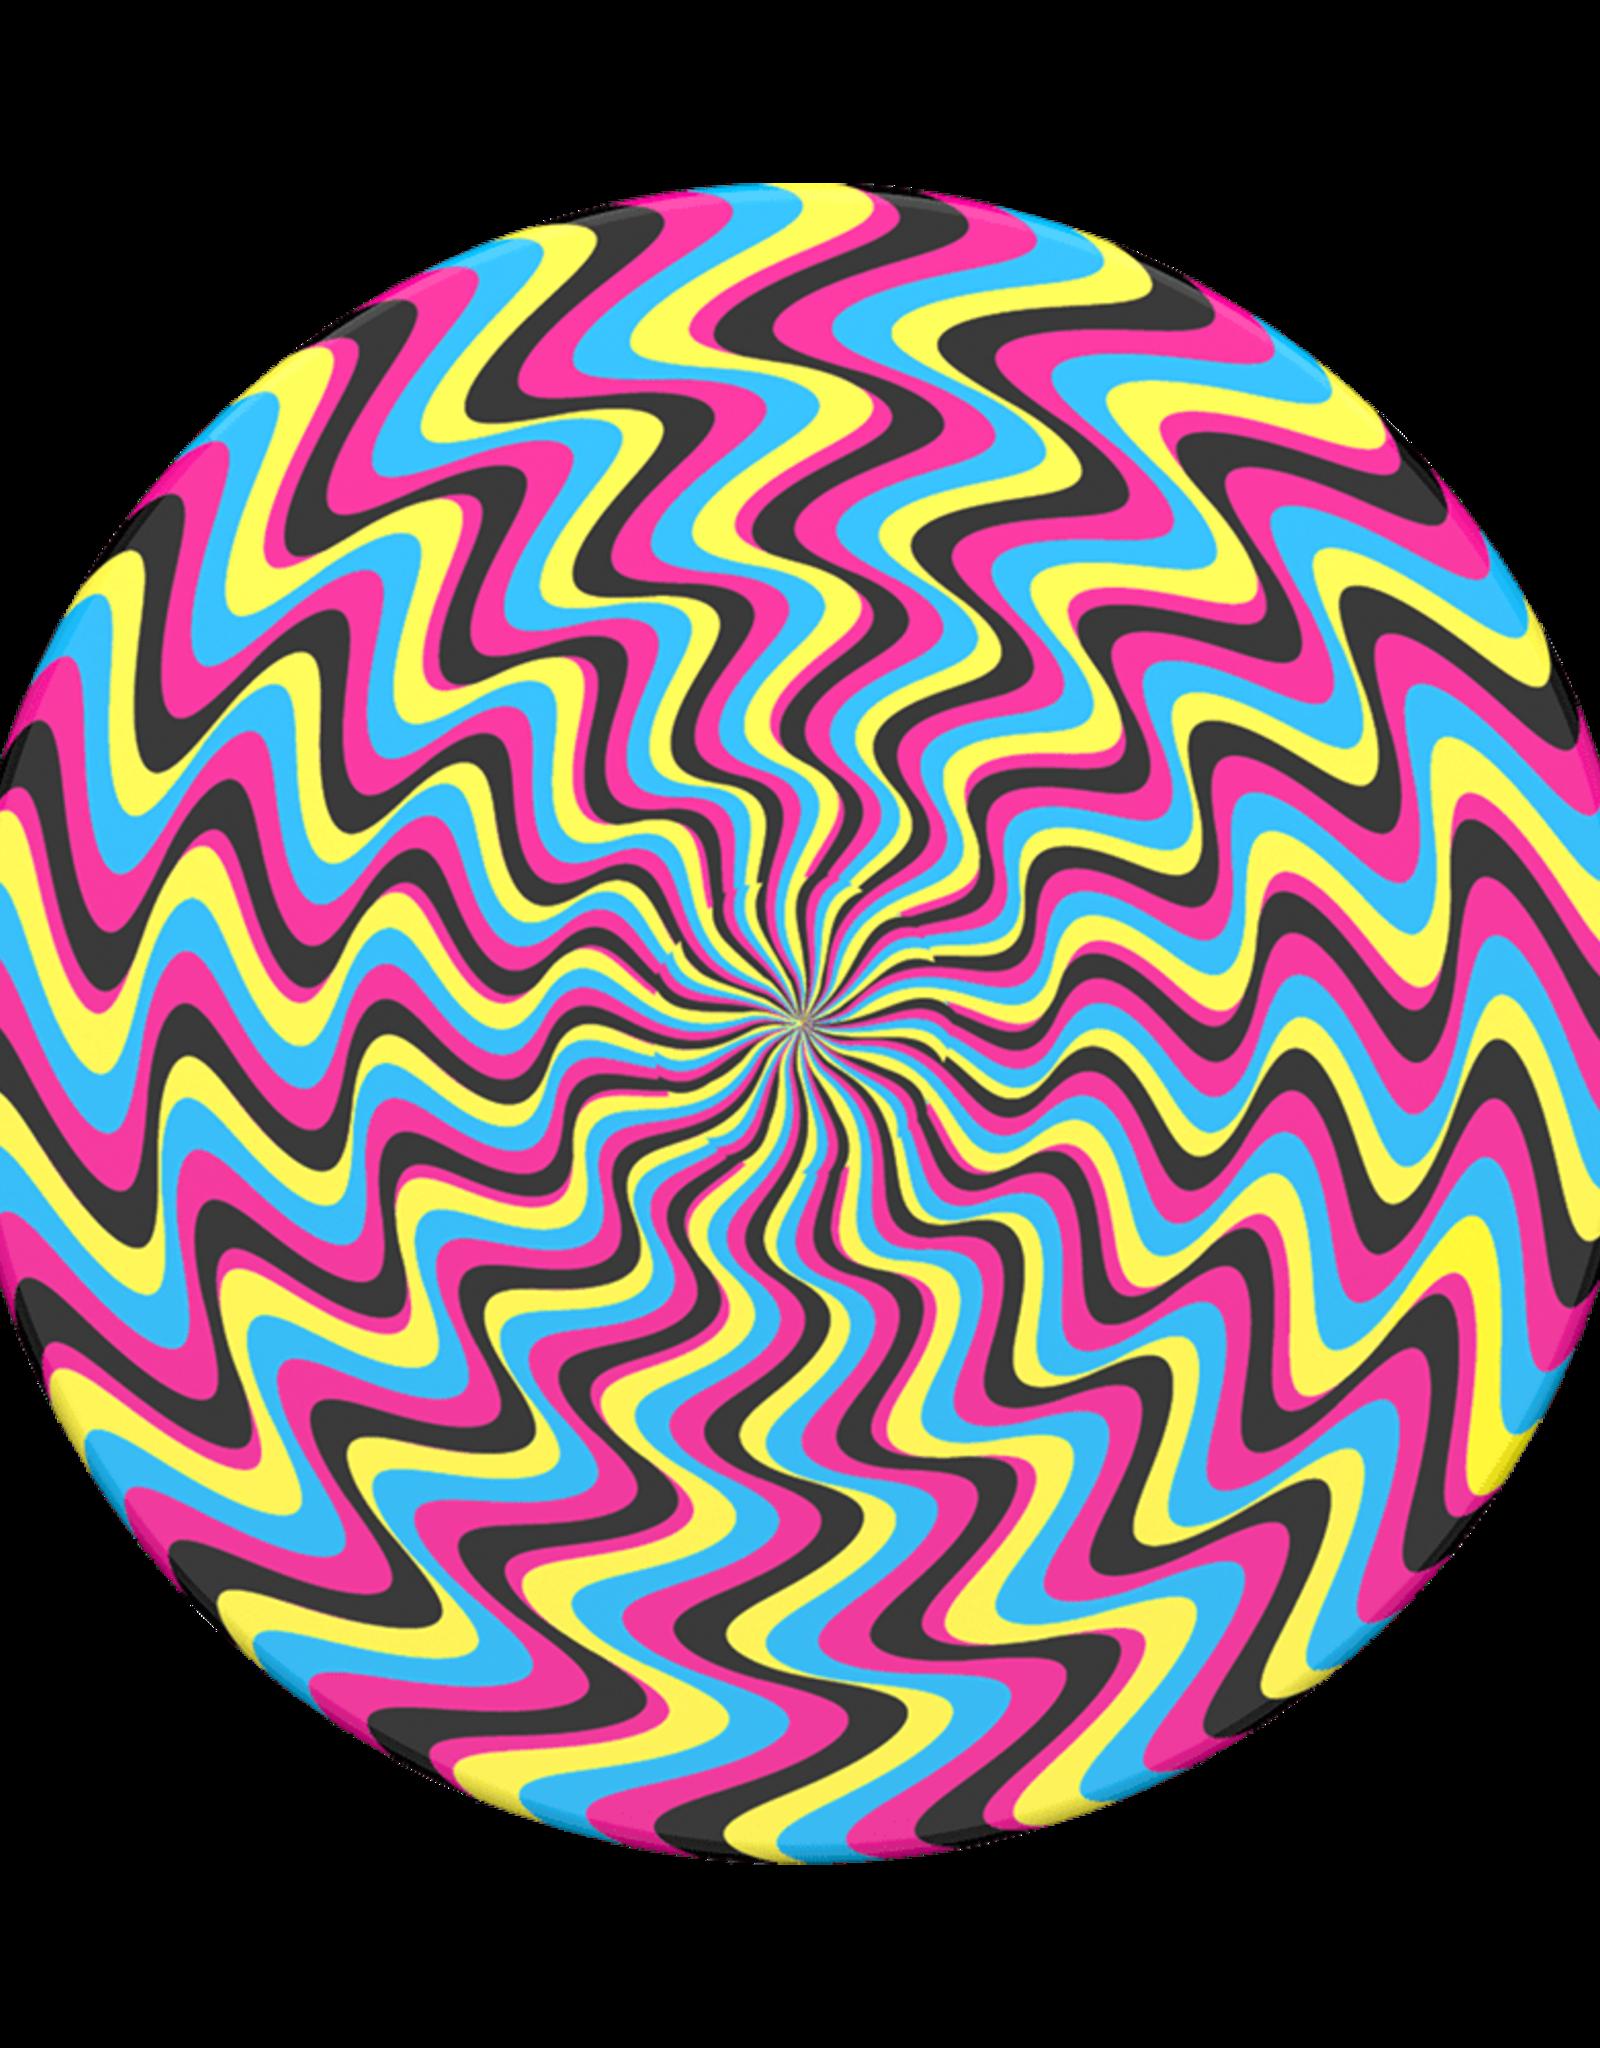 Popsockets PopSockets | PopGrip (Complete Swappable PopGrip)Twist Carnival Swirl | 115-1902